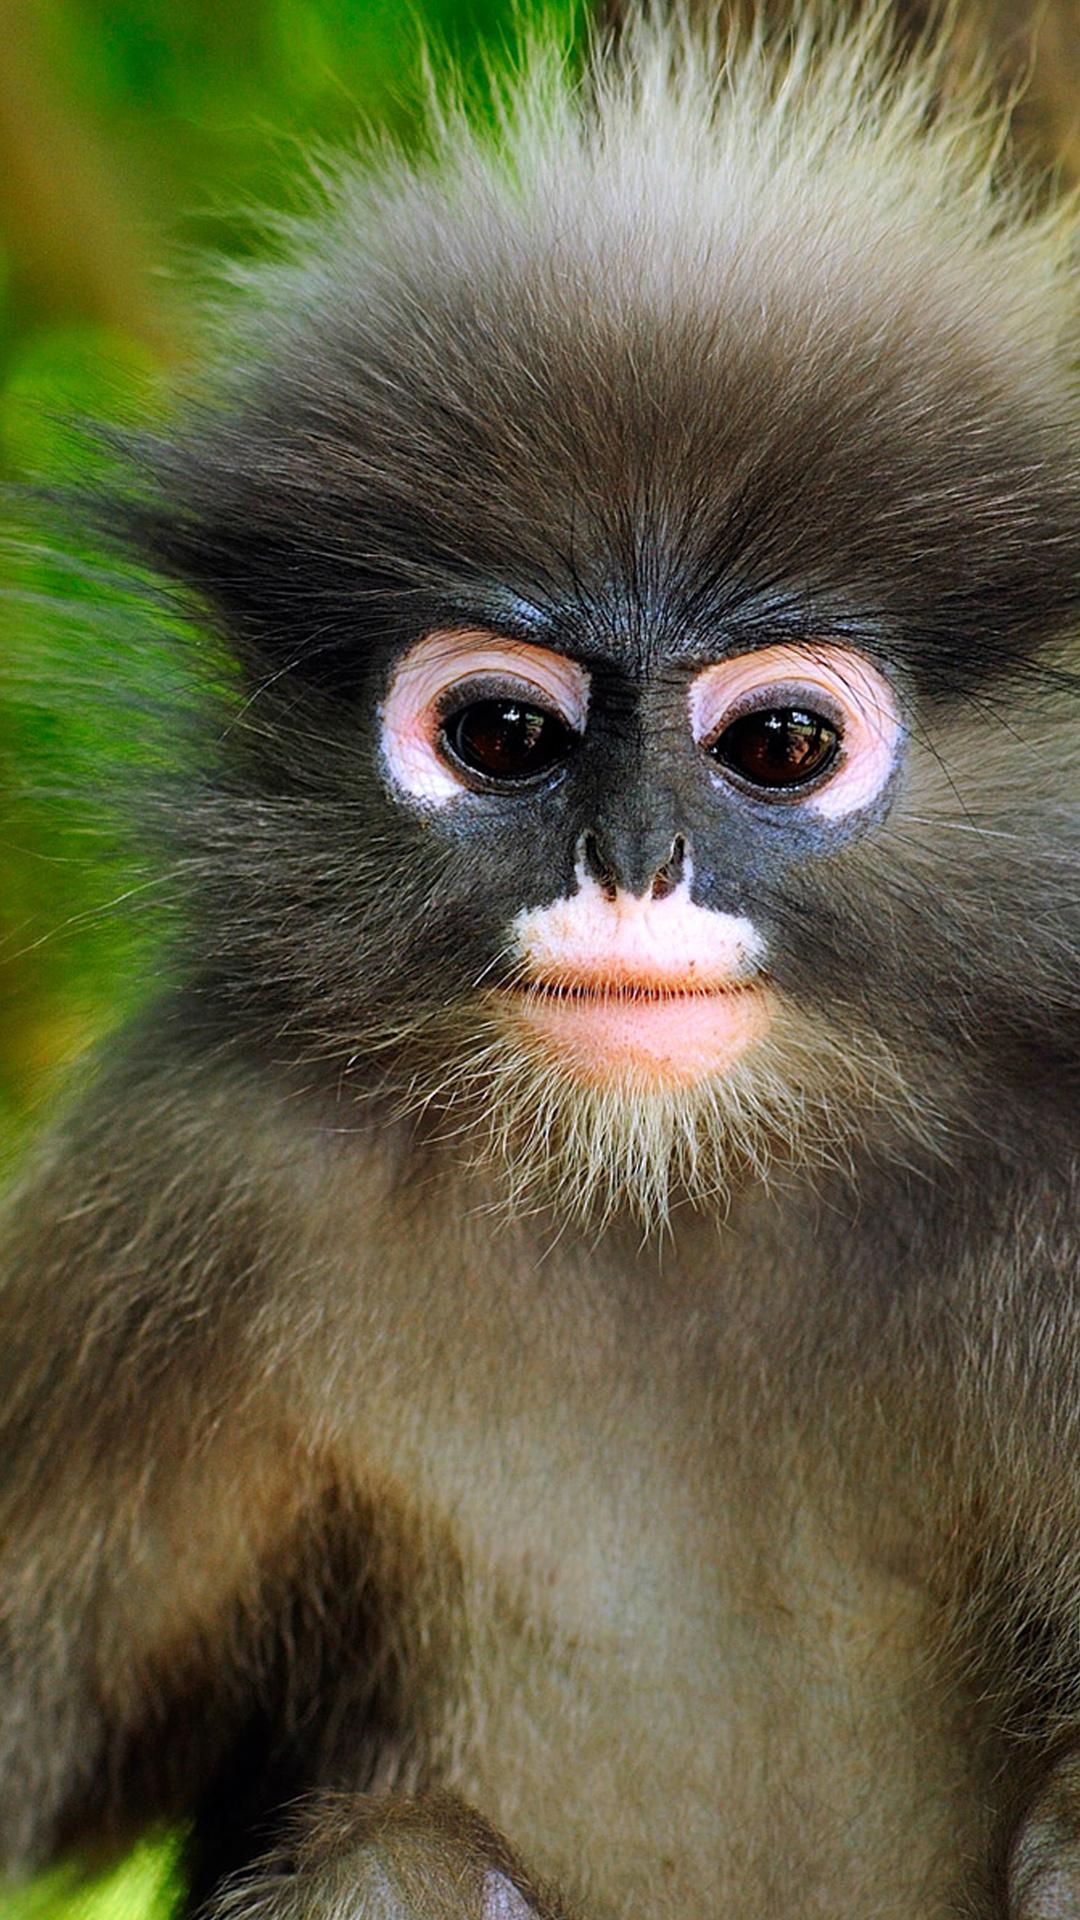 Dusky leaf monkey, Khao Sam Roi Yot National Park, Thailand ((C) Thomas Marent/Visuals Unlimited/Corbis)